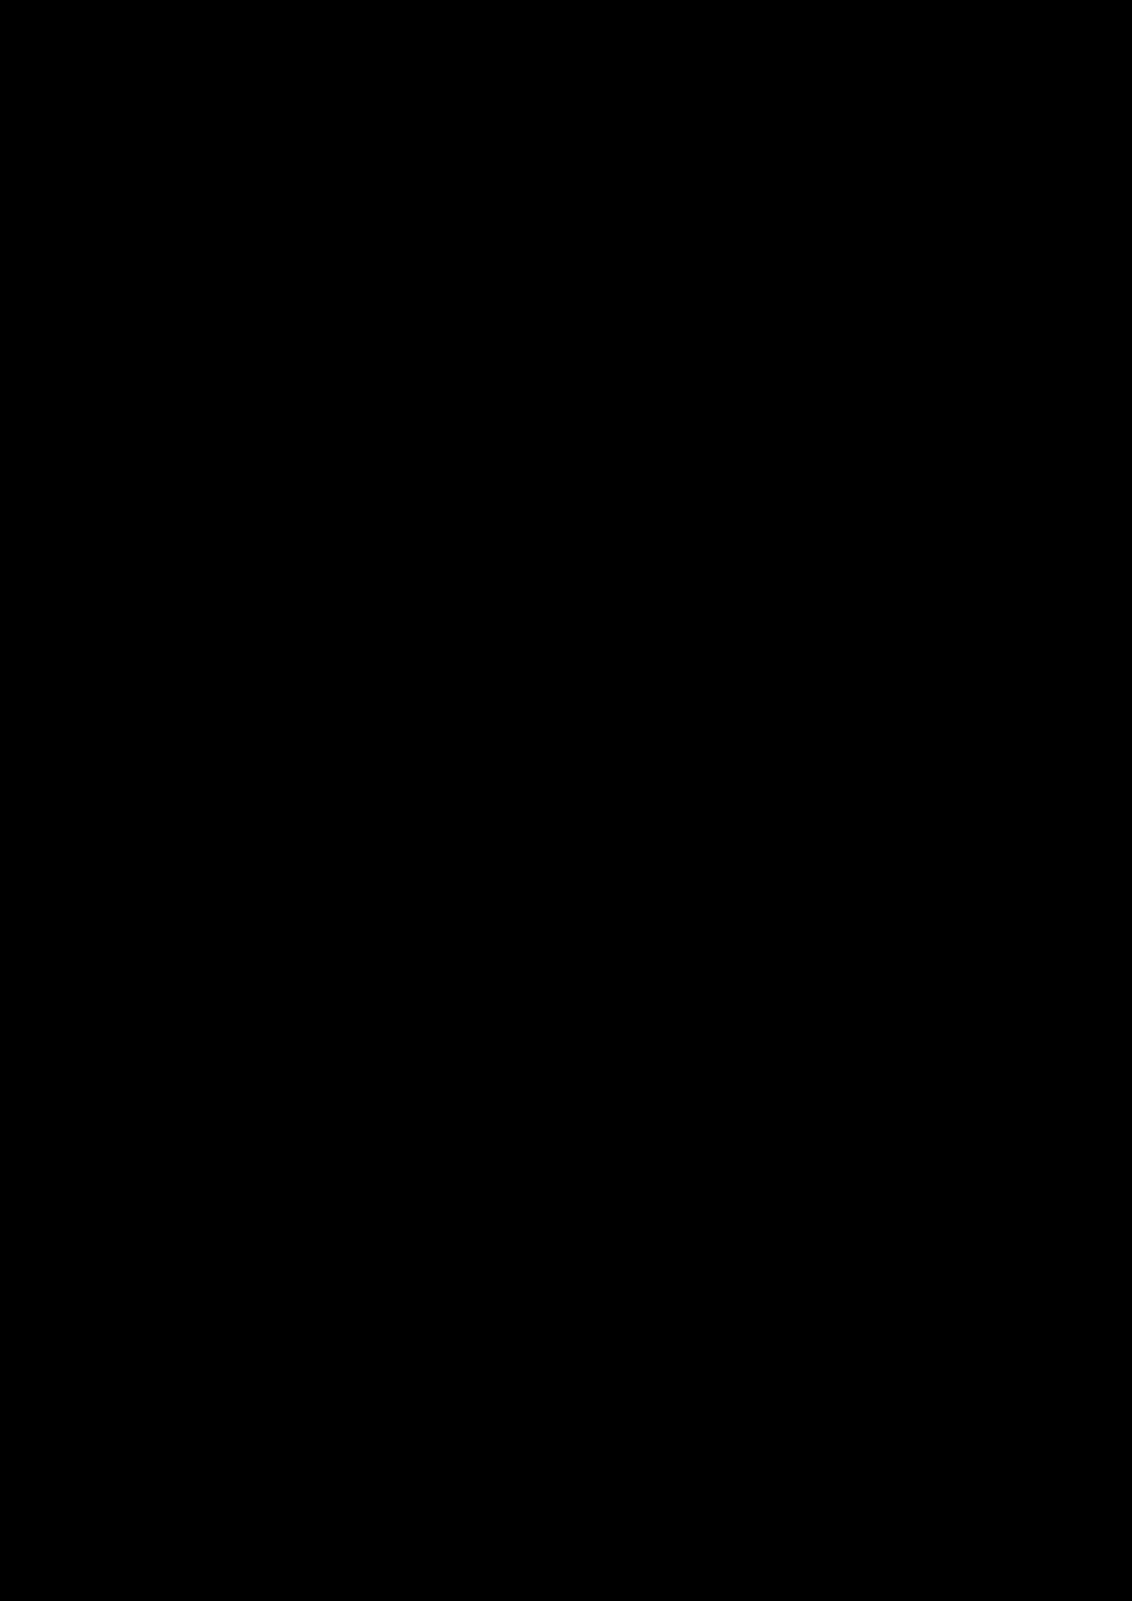 18 berez slide, Image 14